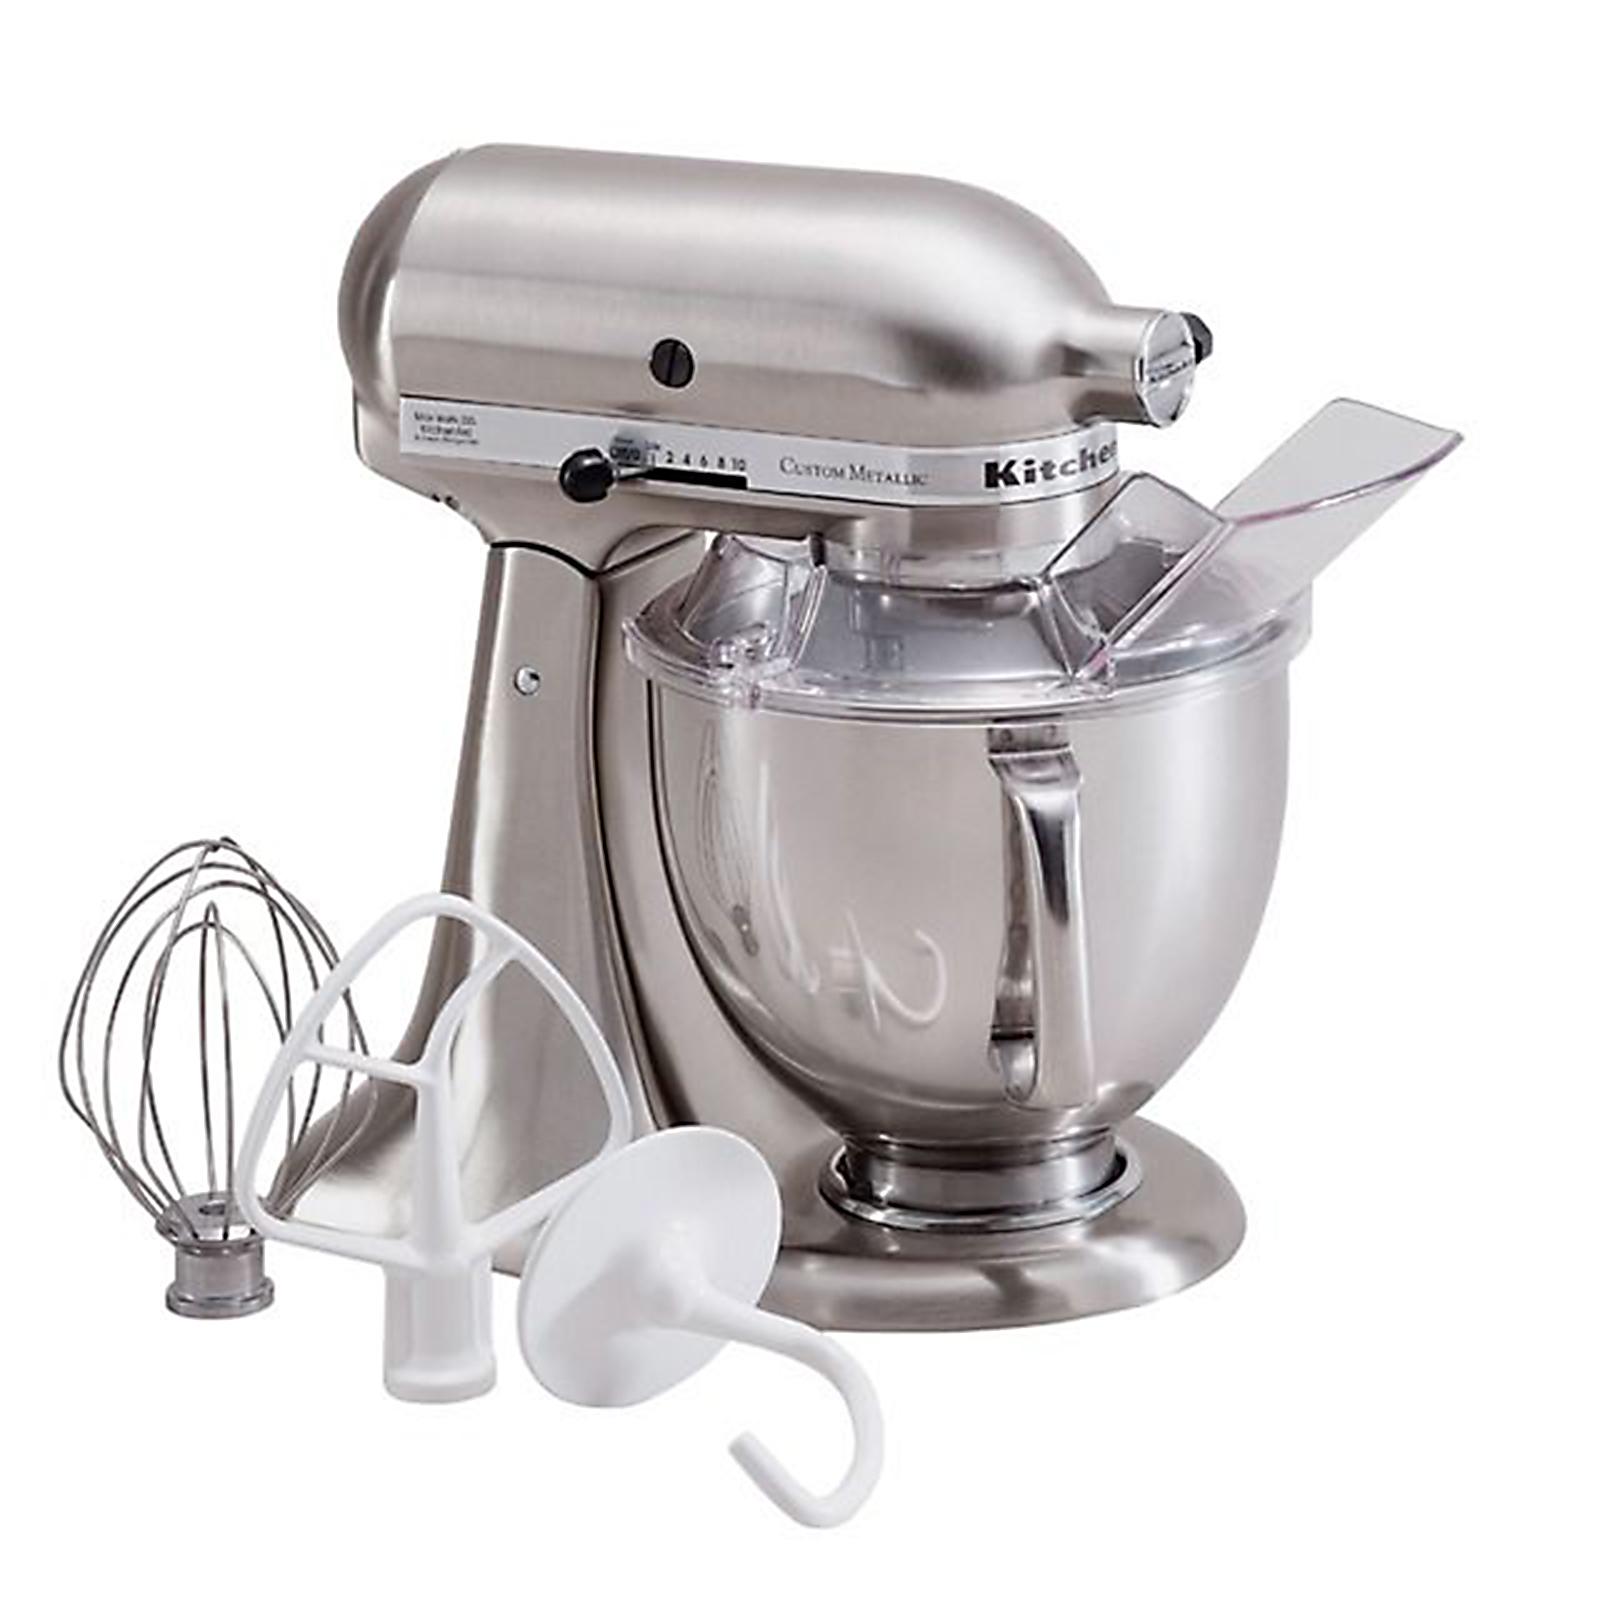 kitchen aid mixers on sale ikea counters kitchenaid custom metallic series 5 quart stand mixer